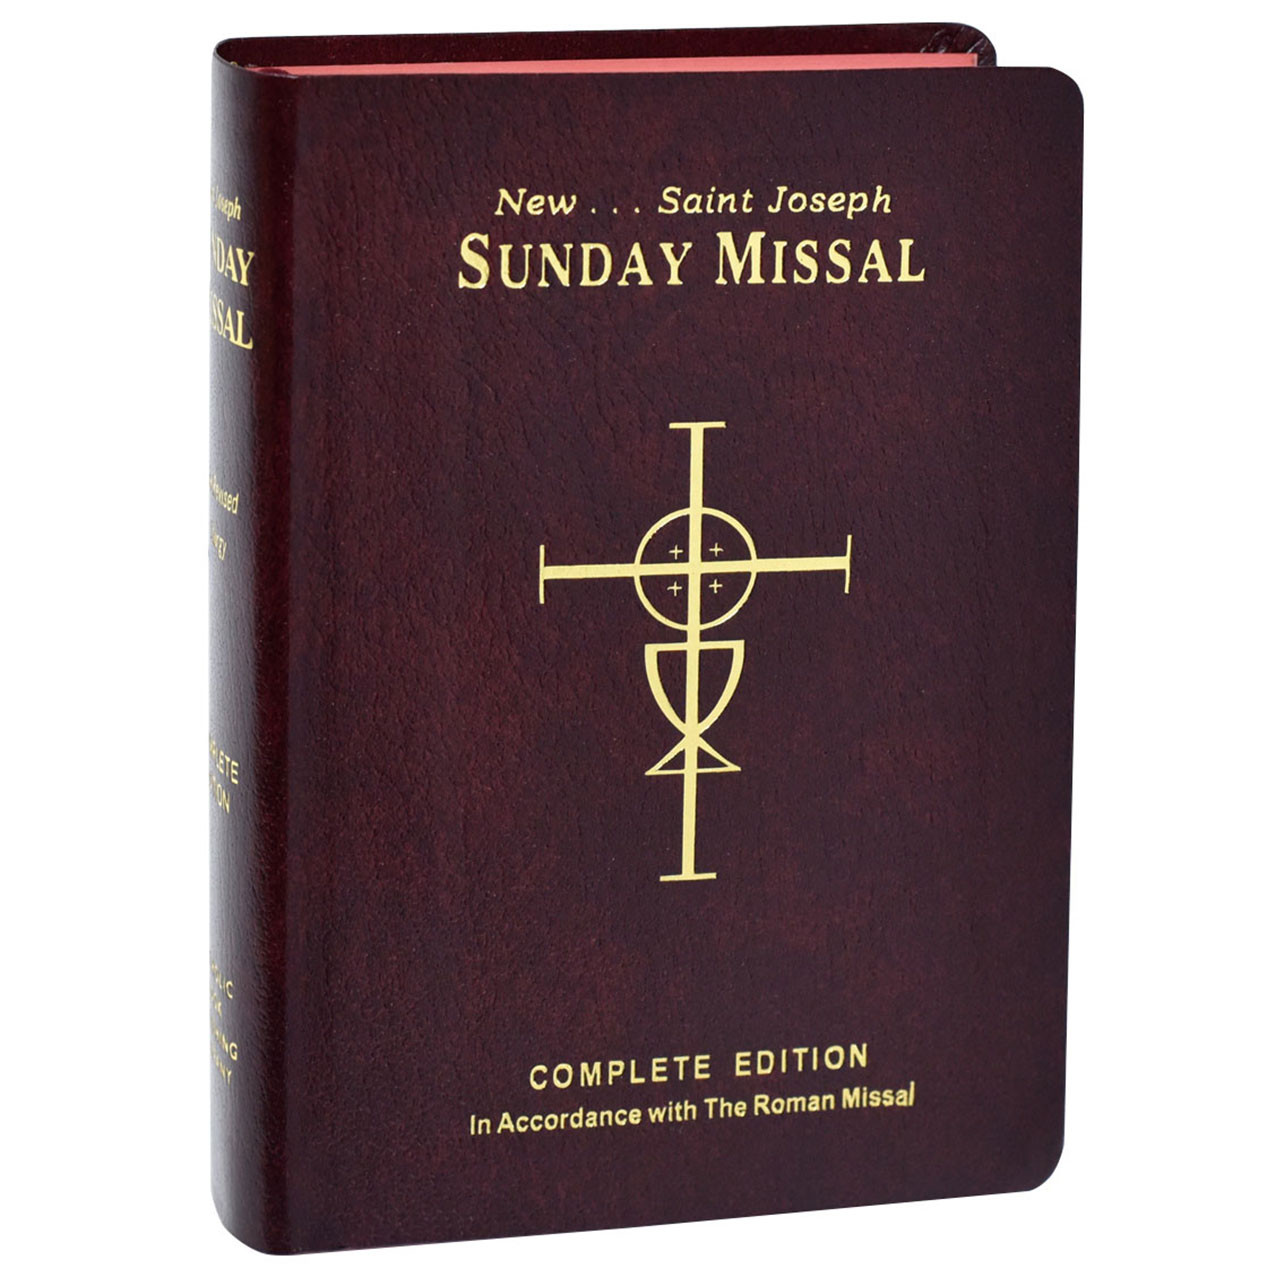 New... St. Joseph Sunday Missal Complete Edition